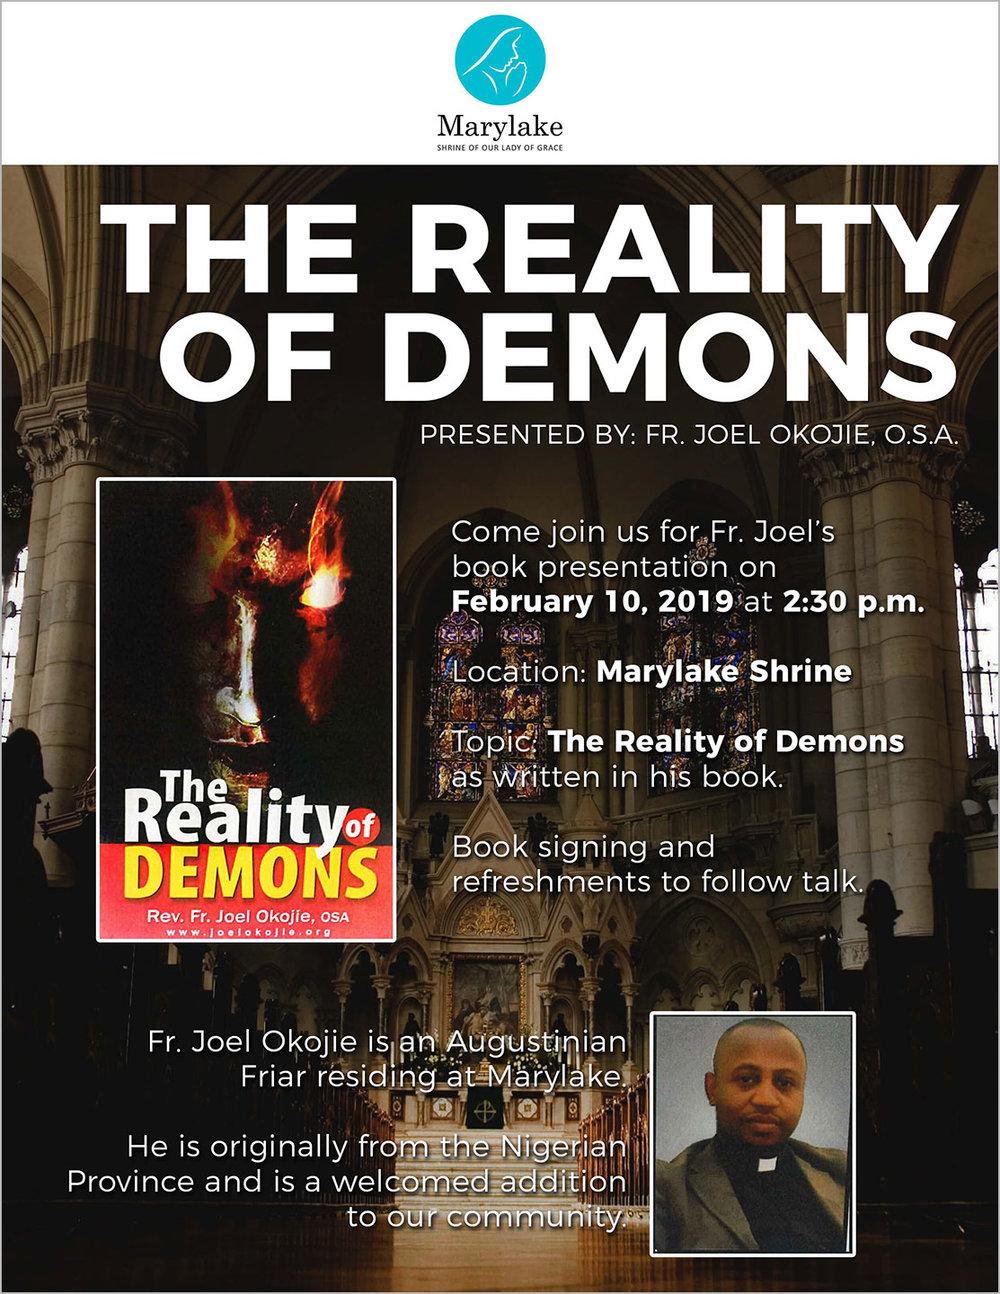 The_Reality_of_Demons.jpg